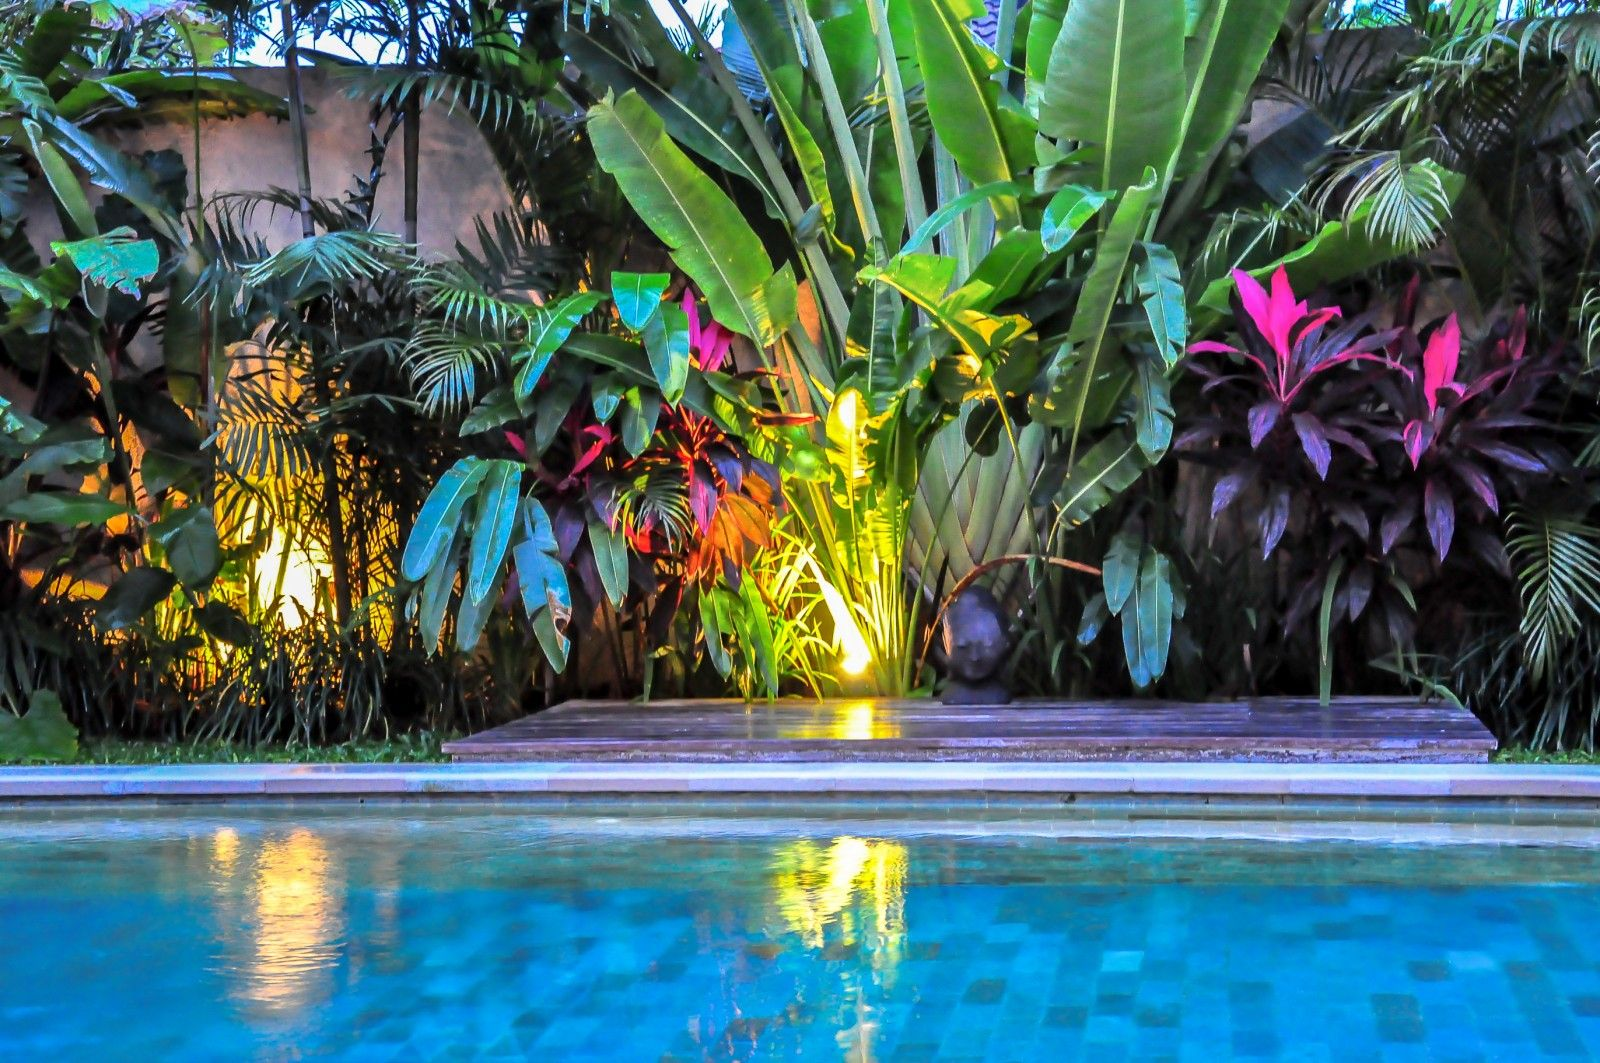 Make Your Own Tiki Paradise | Tiki room, Tropical backyard ...